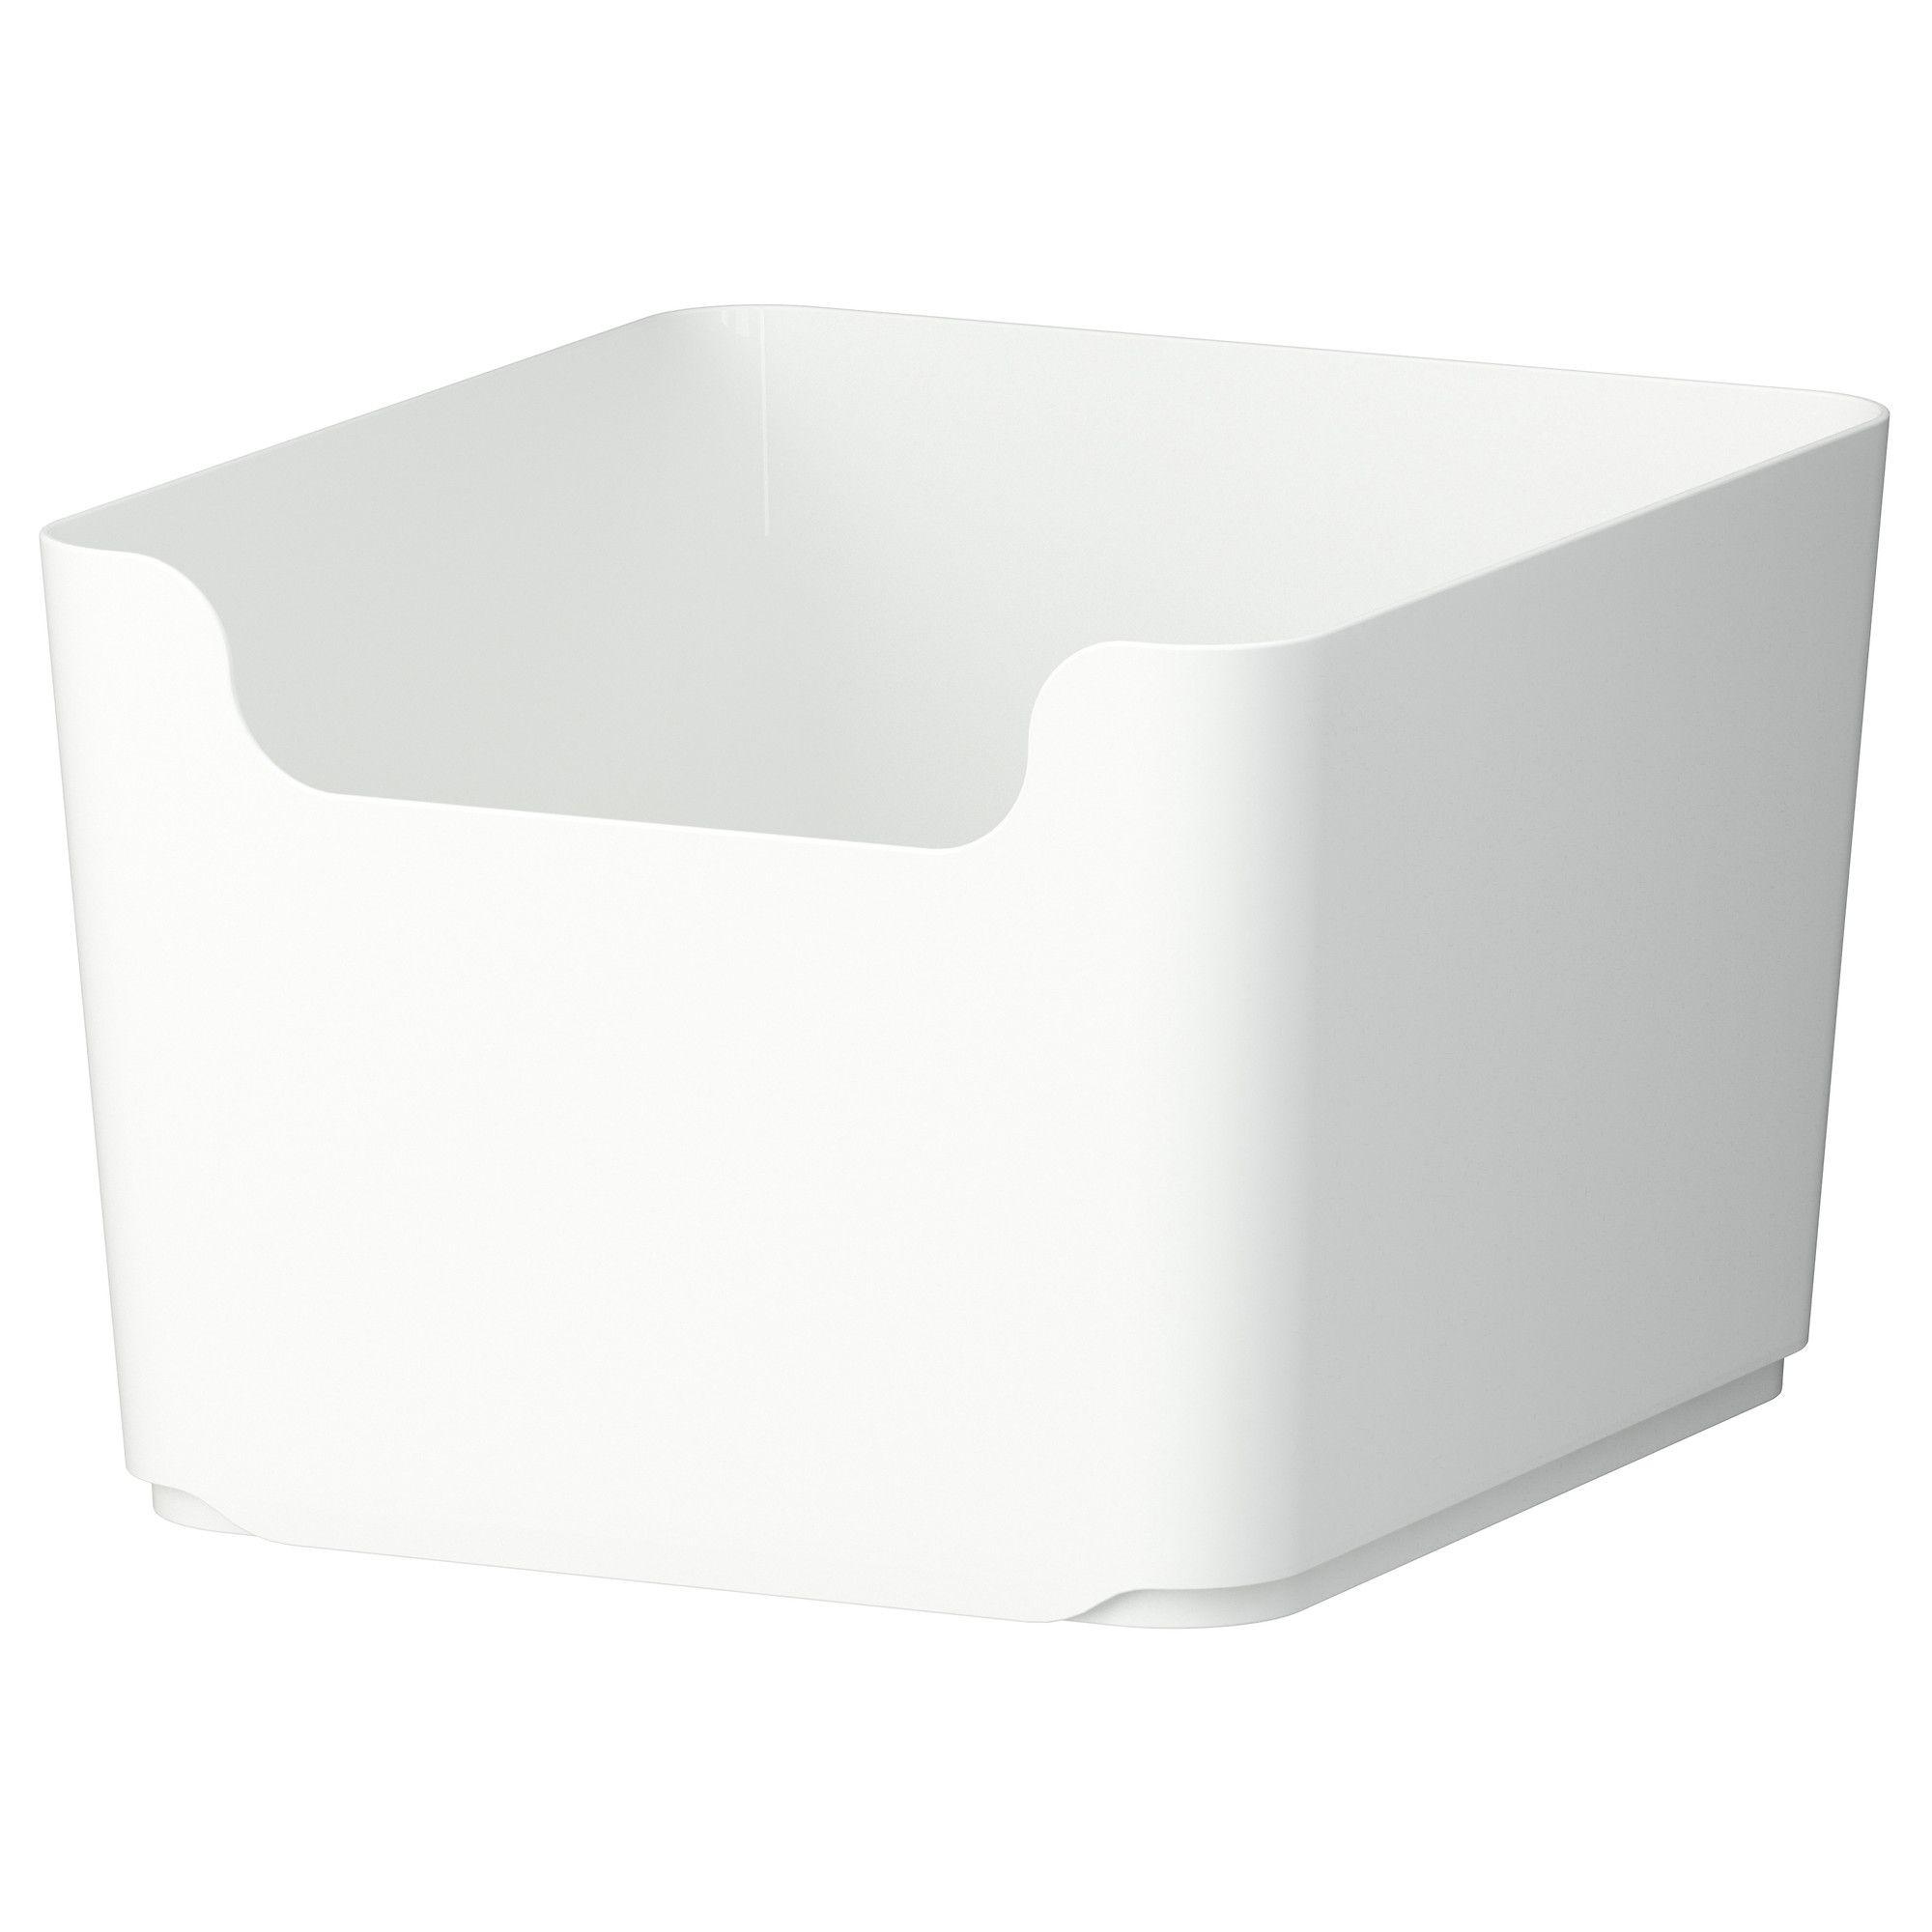 Pluggis Recycling Bin White 4 Gallon Ikea Bacs De Recyclage Stockage Ikea Idees De Recyclage